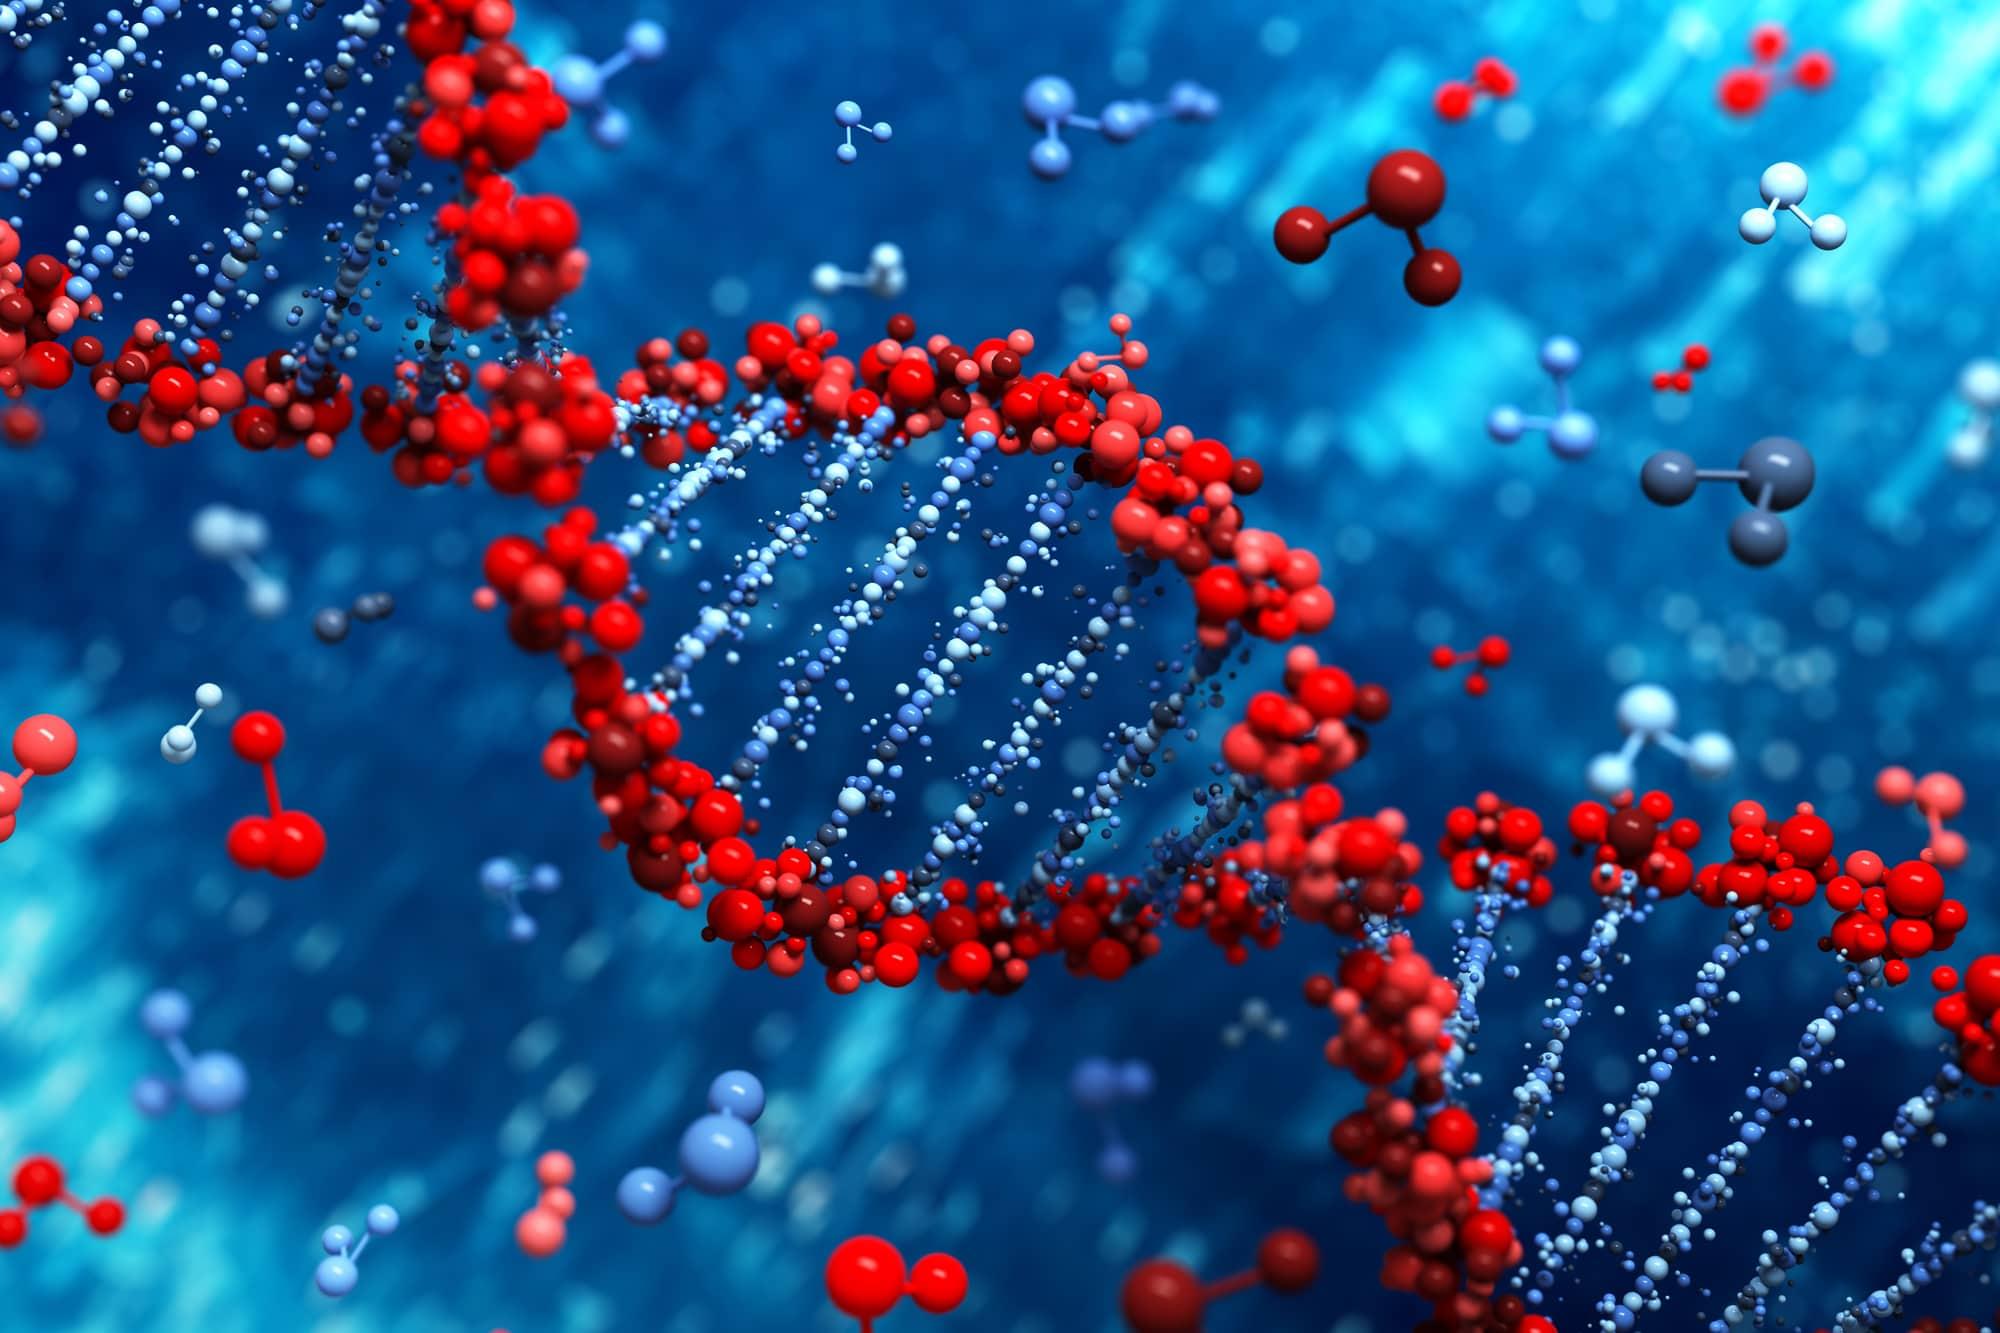 DNA ДНК Джеймс Уотсон лишен званий